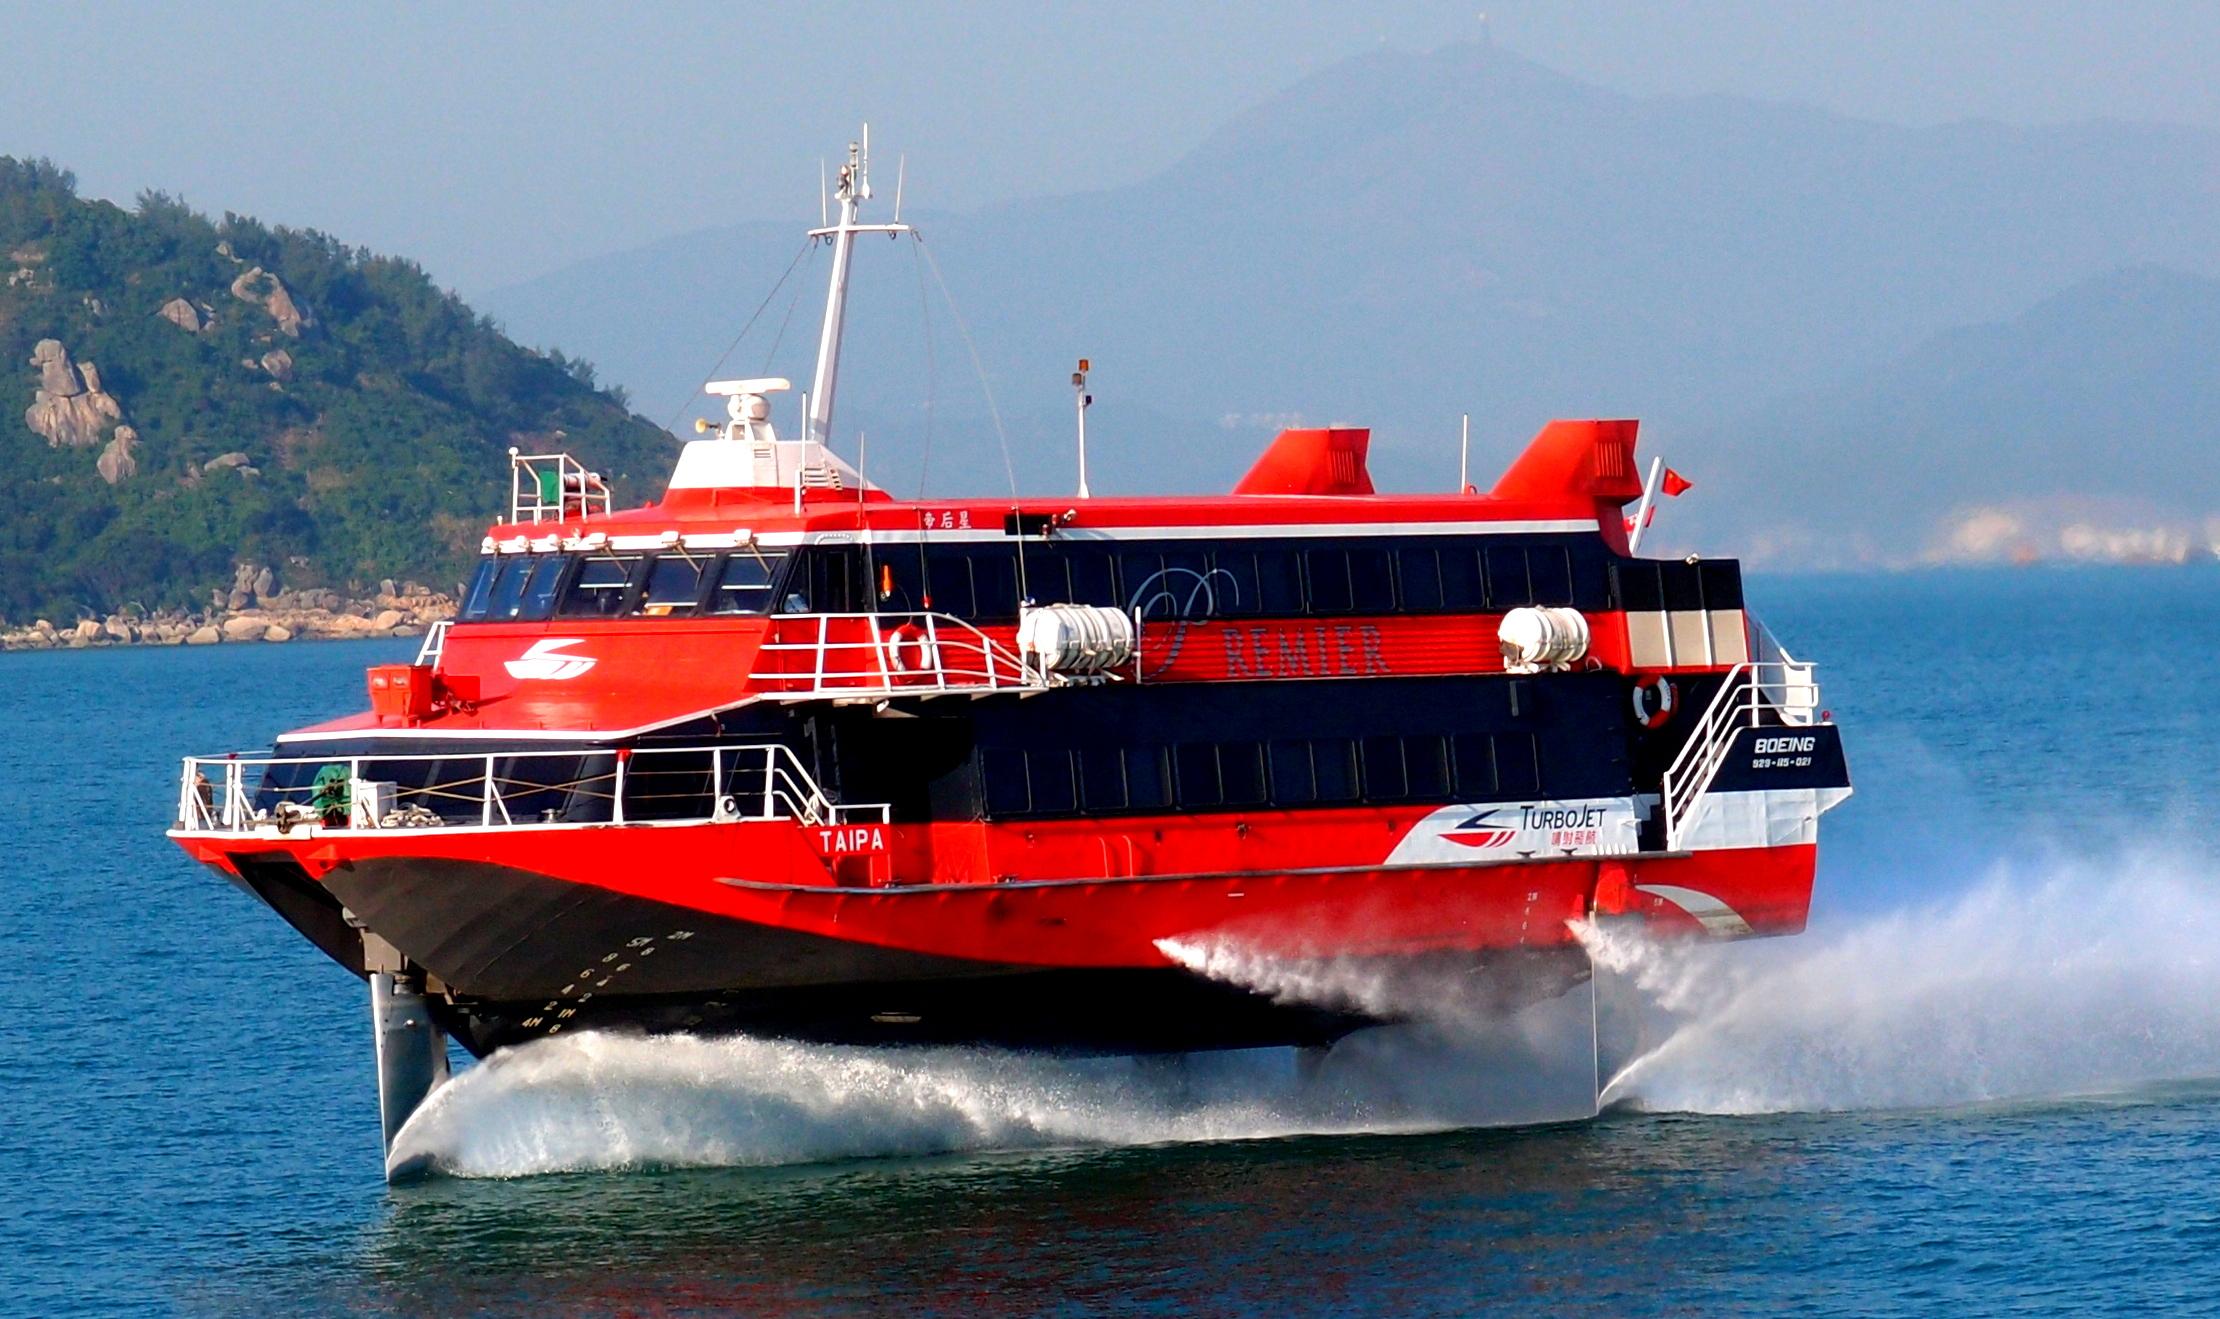 I just love these high speed hydrofoils on the Hong Kong - Macau run